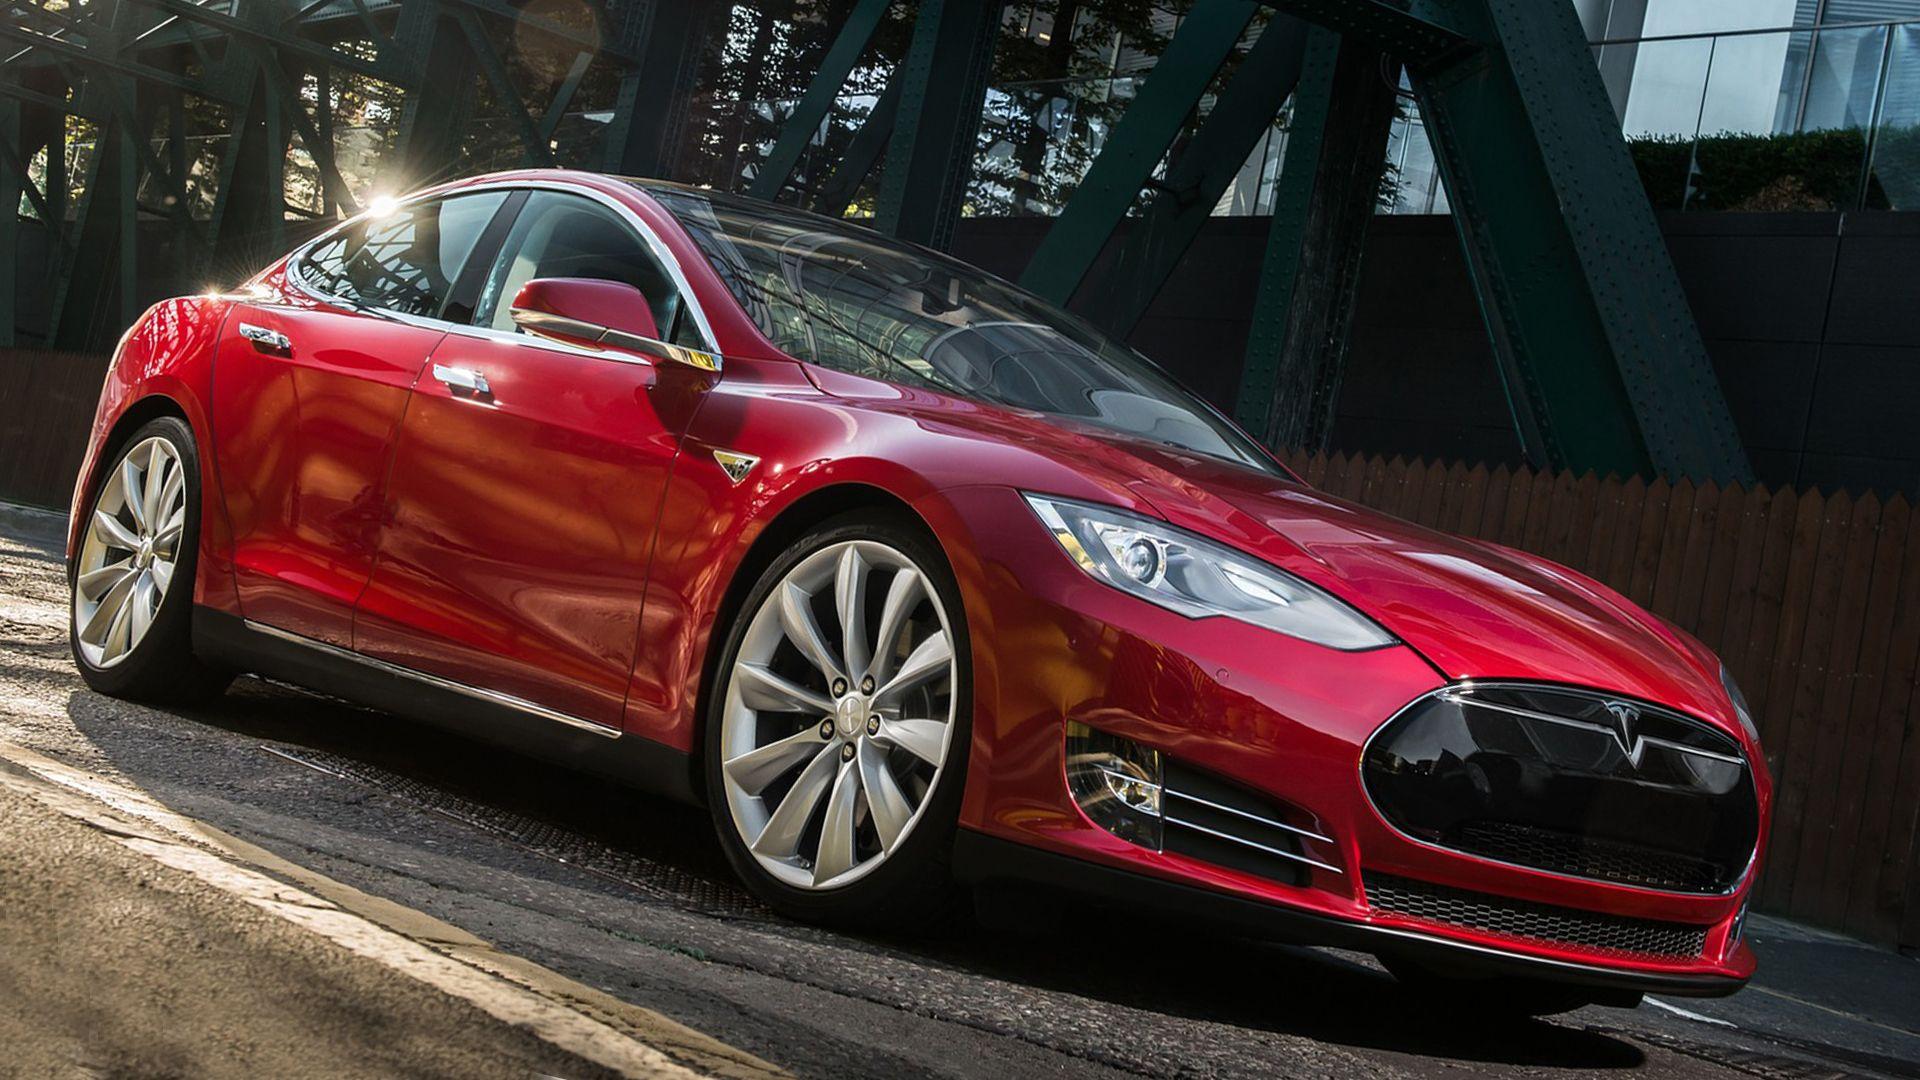 New 2020 Interior Tesla Model S HD Desktop Tesla model s